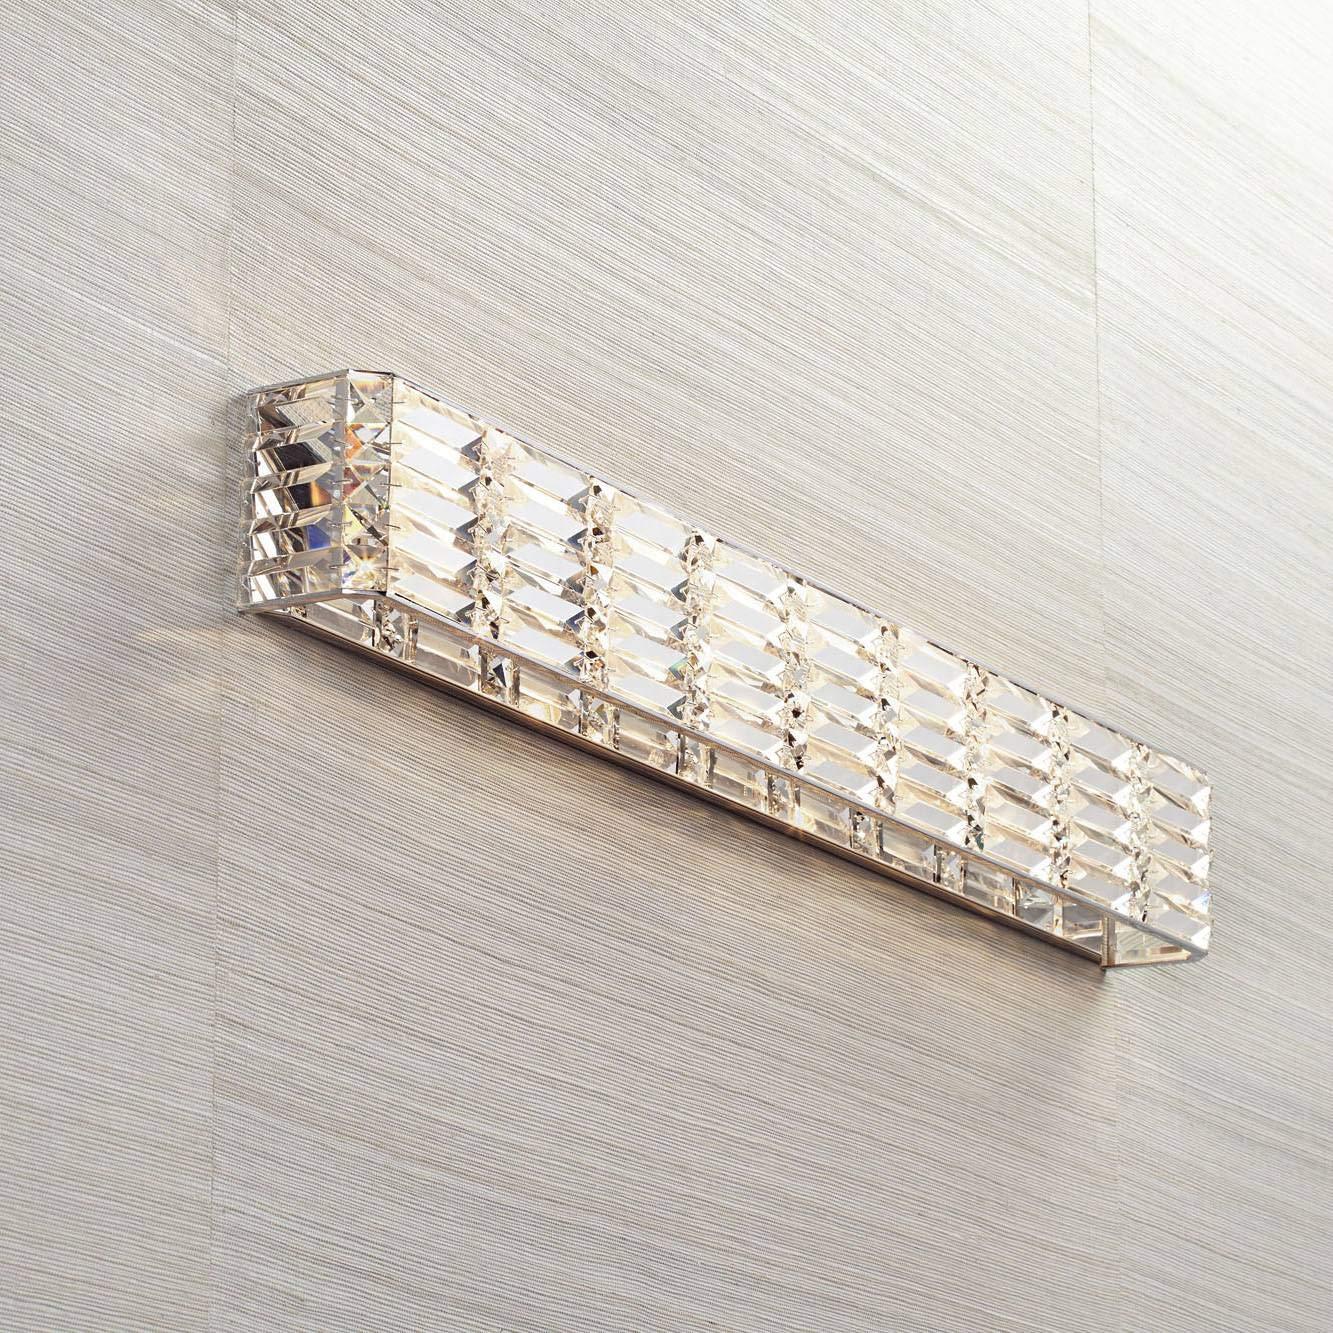 "Vivienne Modern Wall Light Chrome Cut Crystal 35"" Vanity Fixture Bathroom Over Mirror Bedroom"